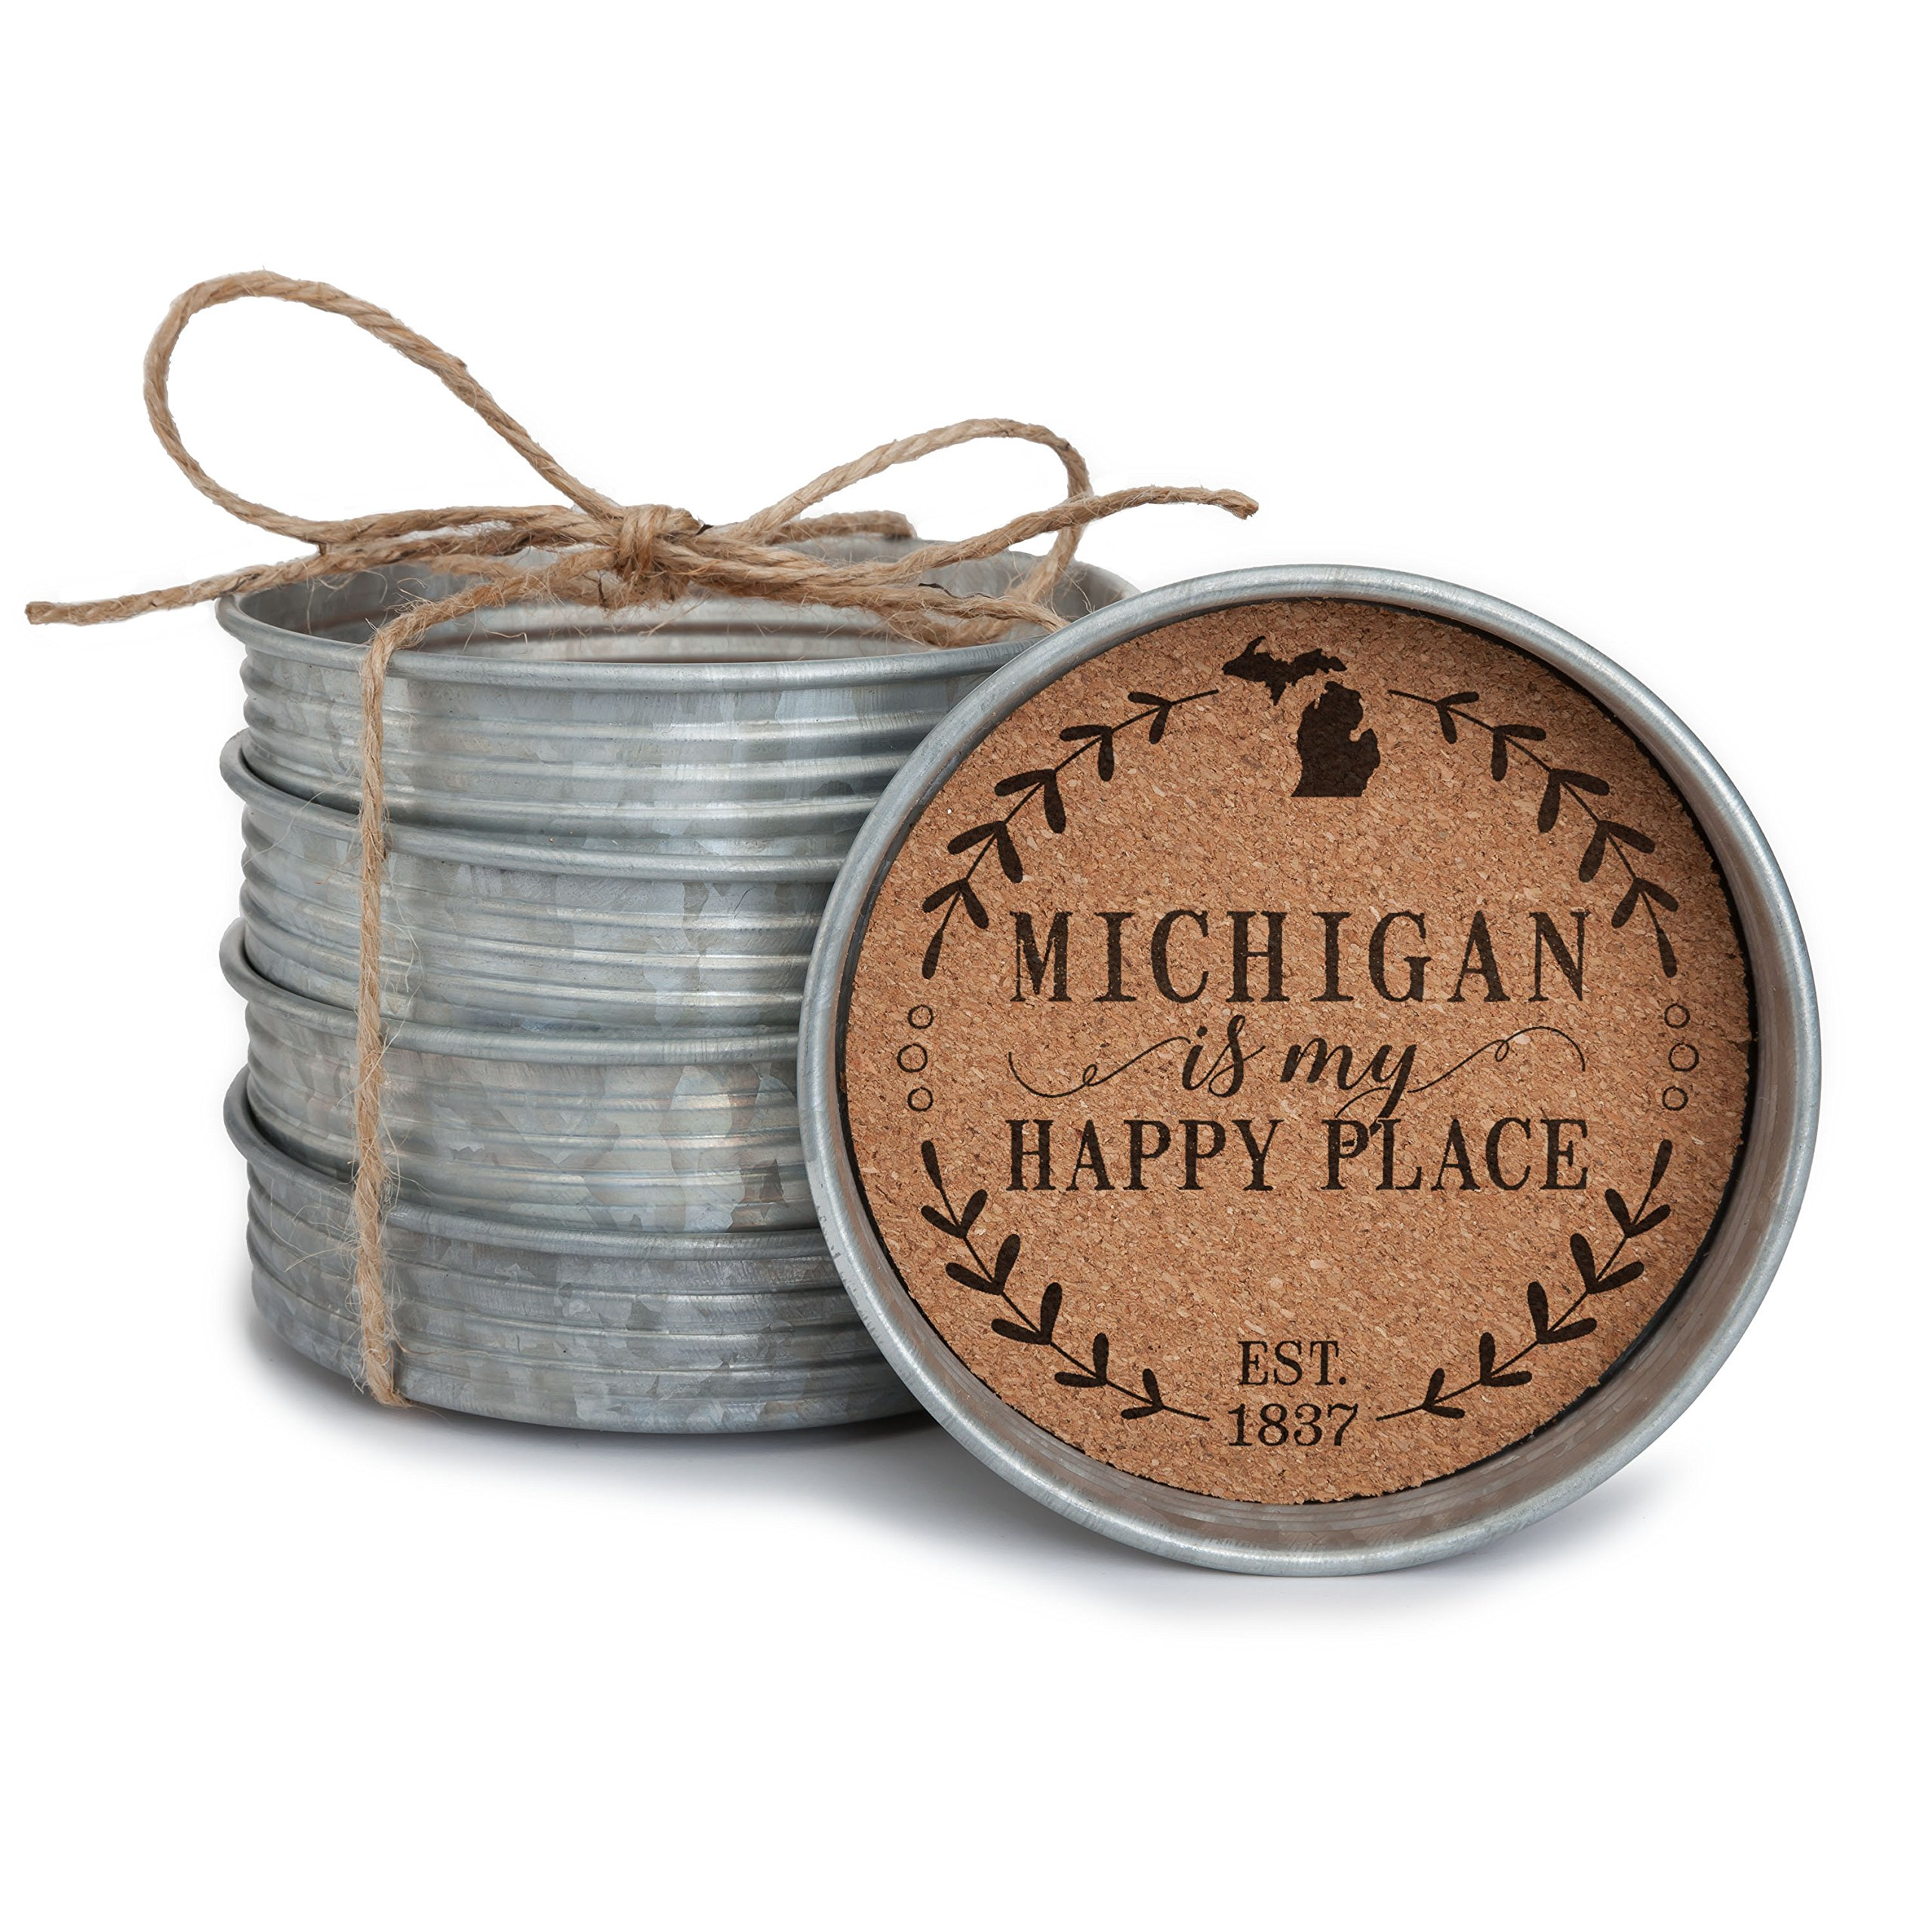 Occasionally Made 4'' x 4'' x 1'' Michigan Mason Jar Lid Coaster Stack